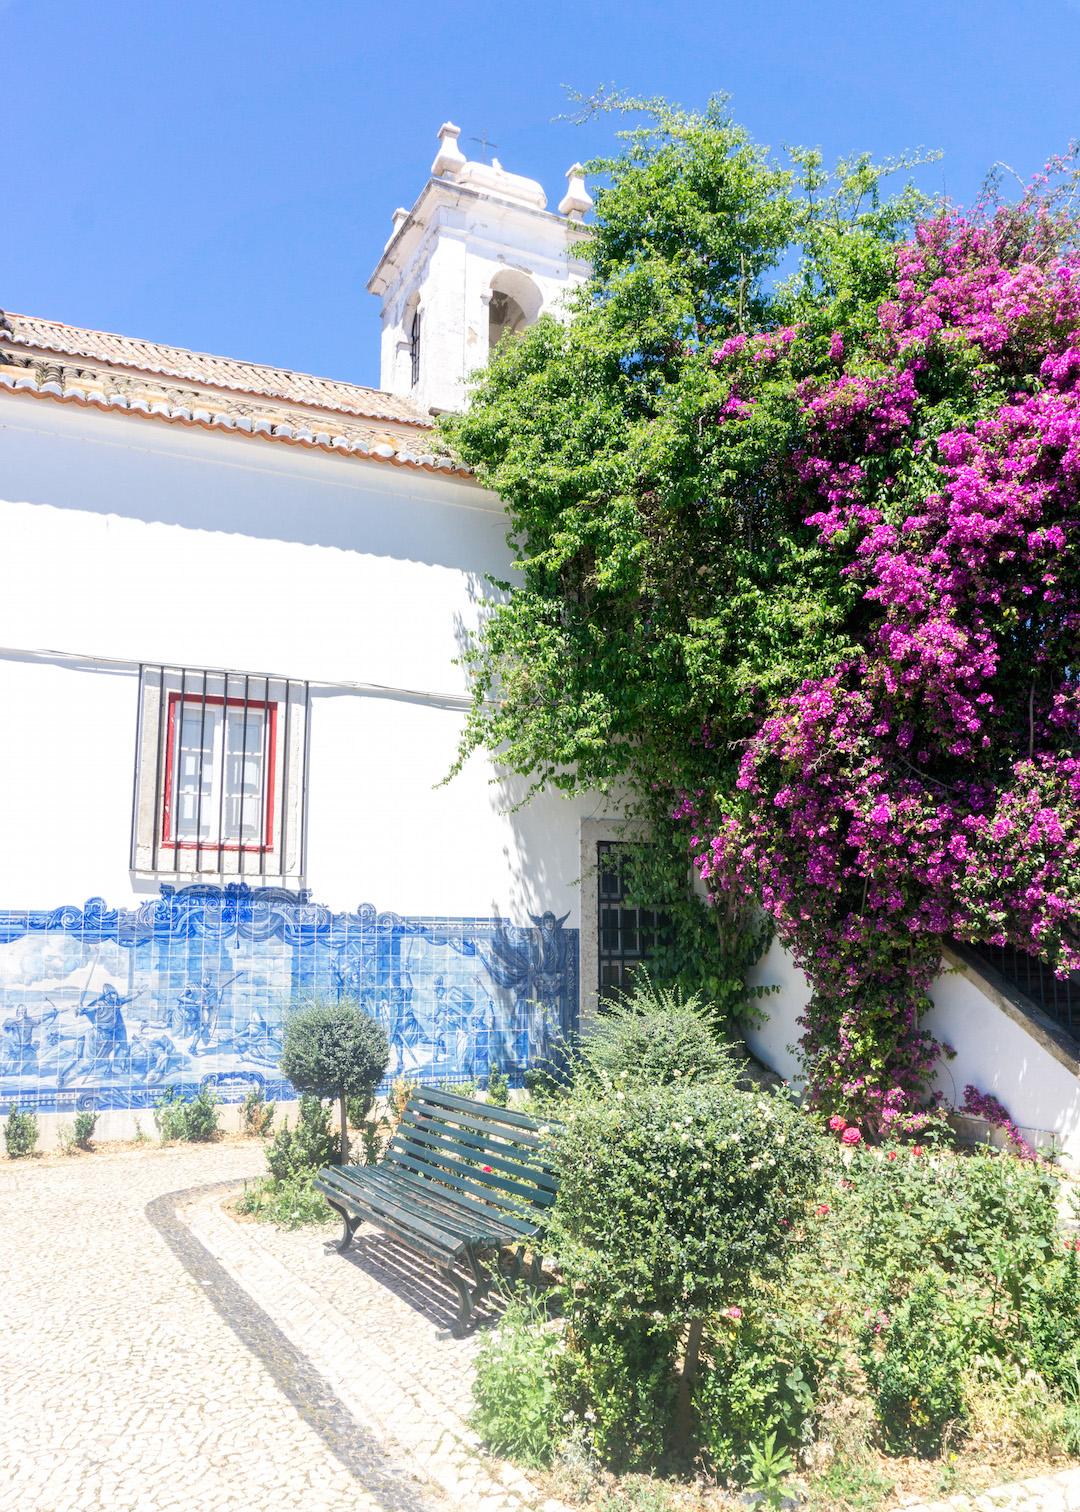 Her_Travel_Edit_Lisbon_Miradouro_de_Santa_Luzia